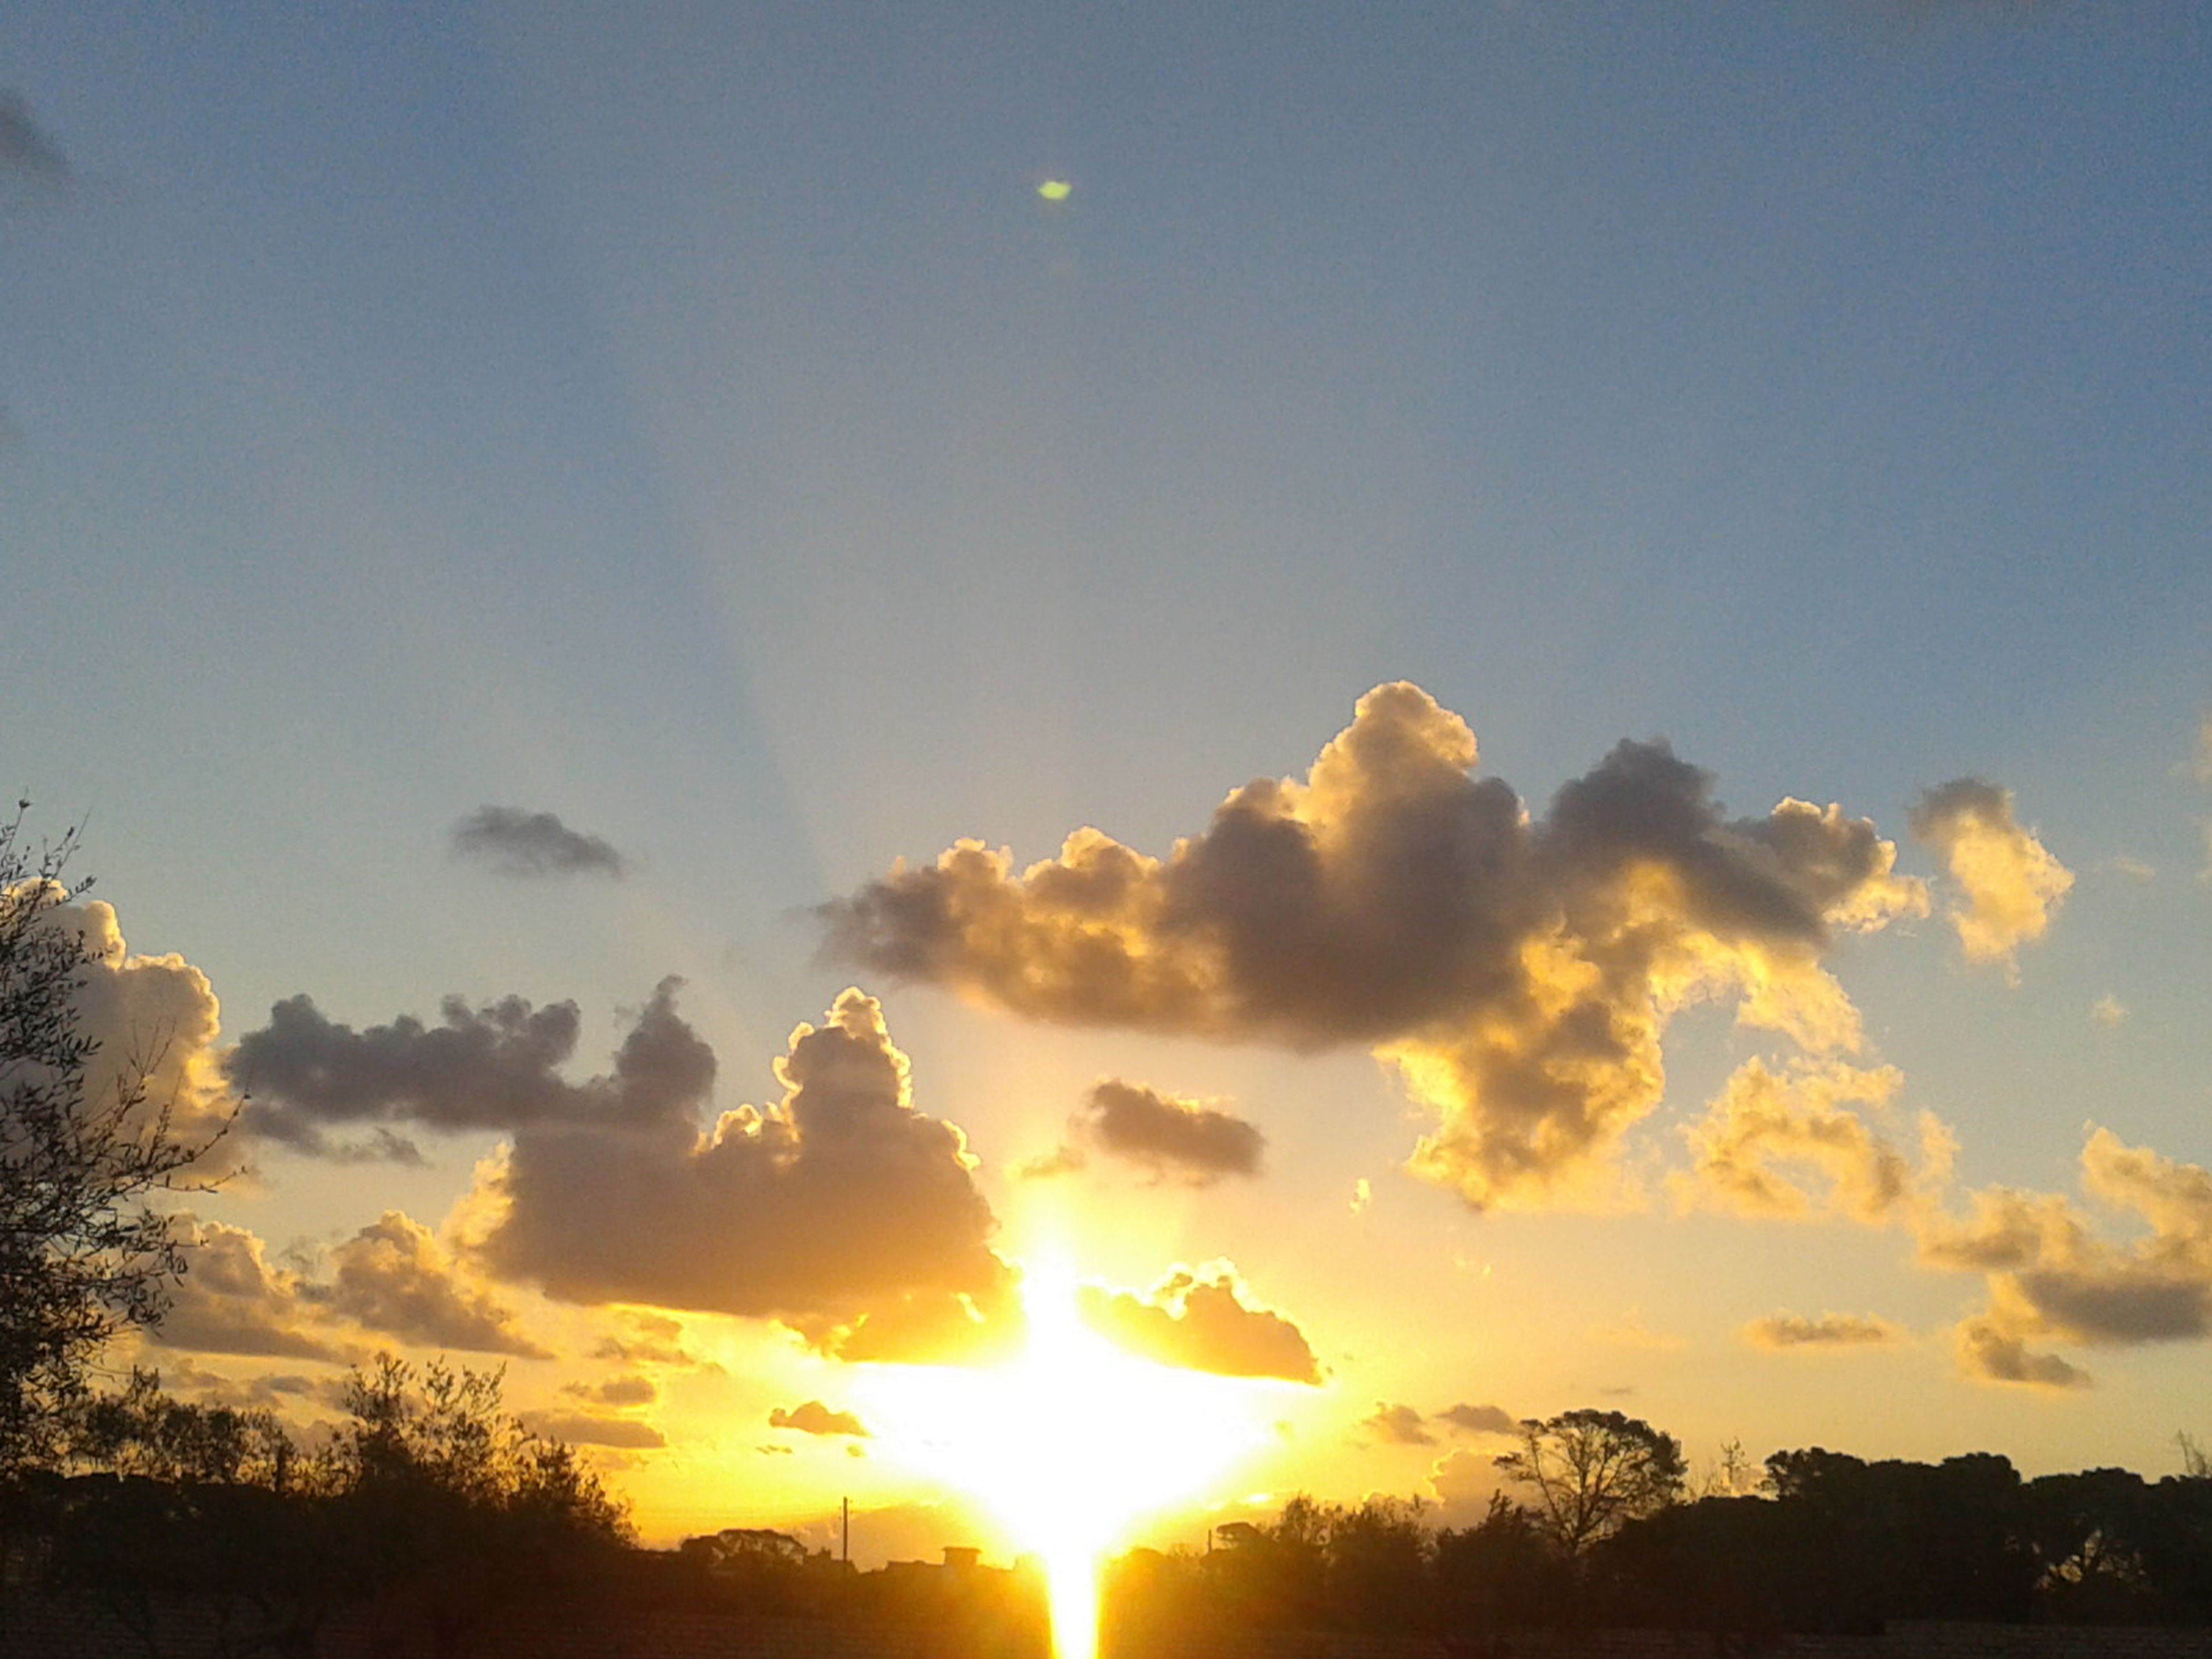 sun, sunset, sky, scenics, beauty in nature, sunbeam, silhouette, tranquil scene, tranquility, sunlight, nature, orange color, idyllic, cloud - sky, low angle view, lens flare, tree, landscape, cloud, back lit